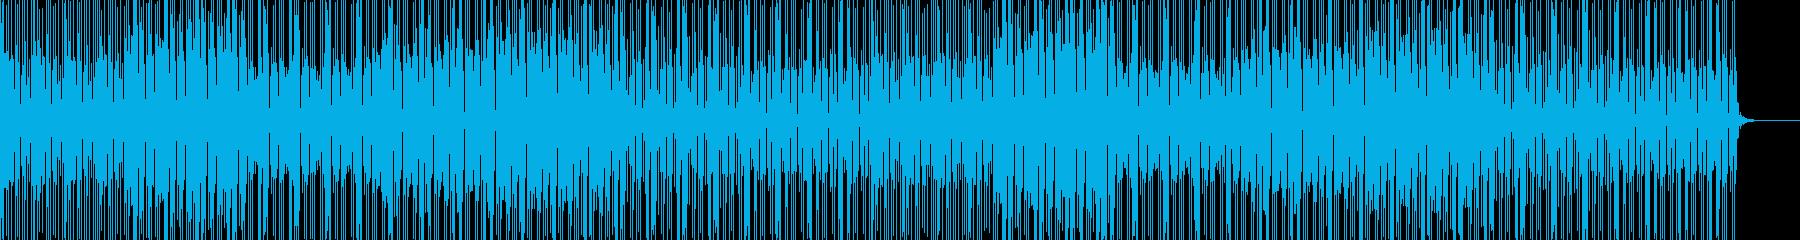 R&Bの再生済みの波形